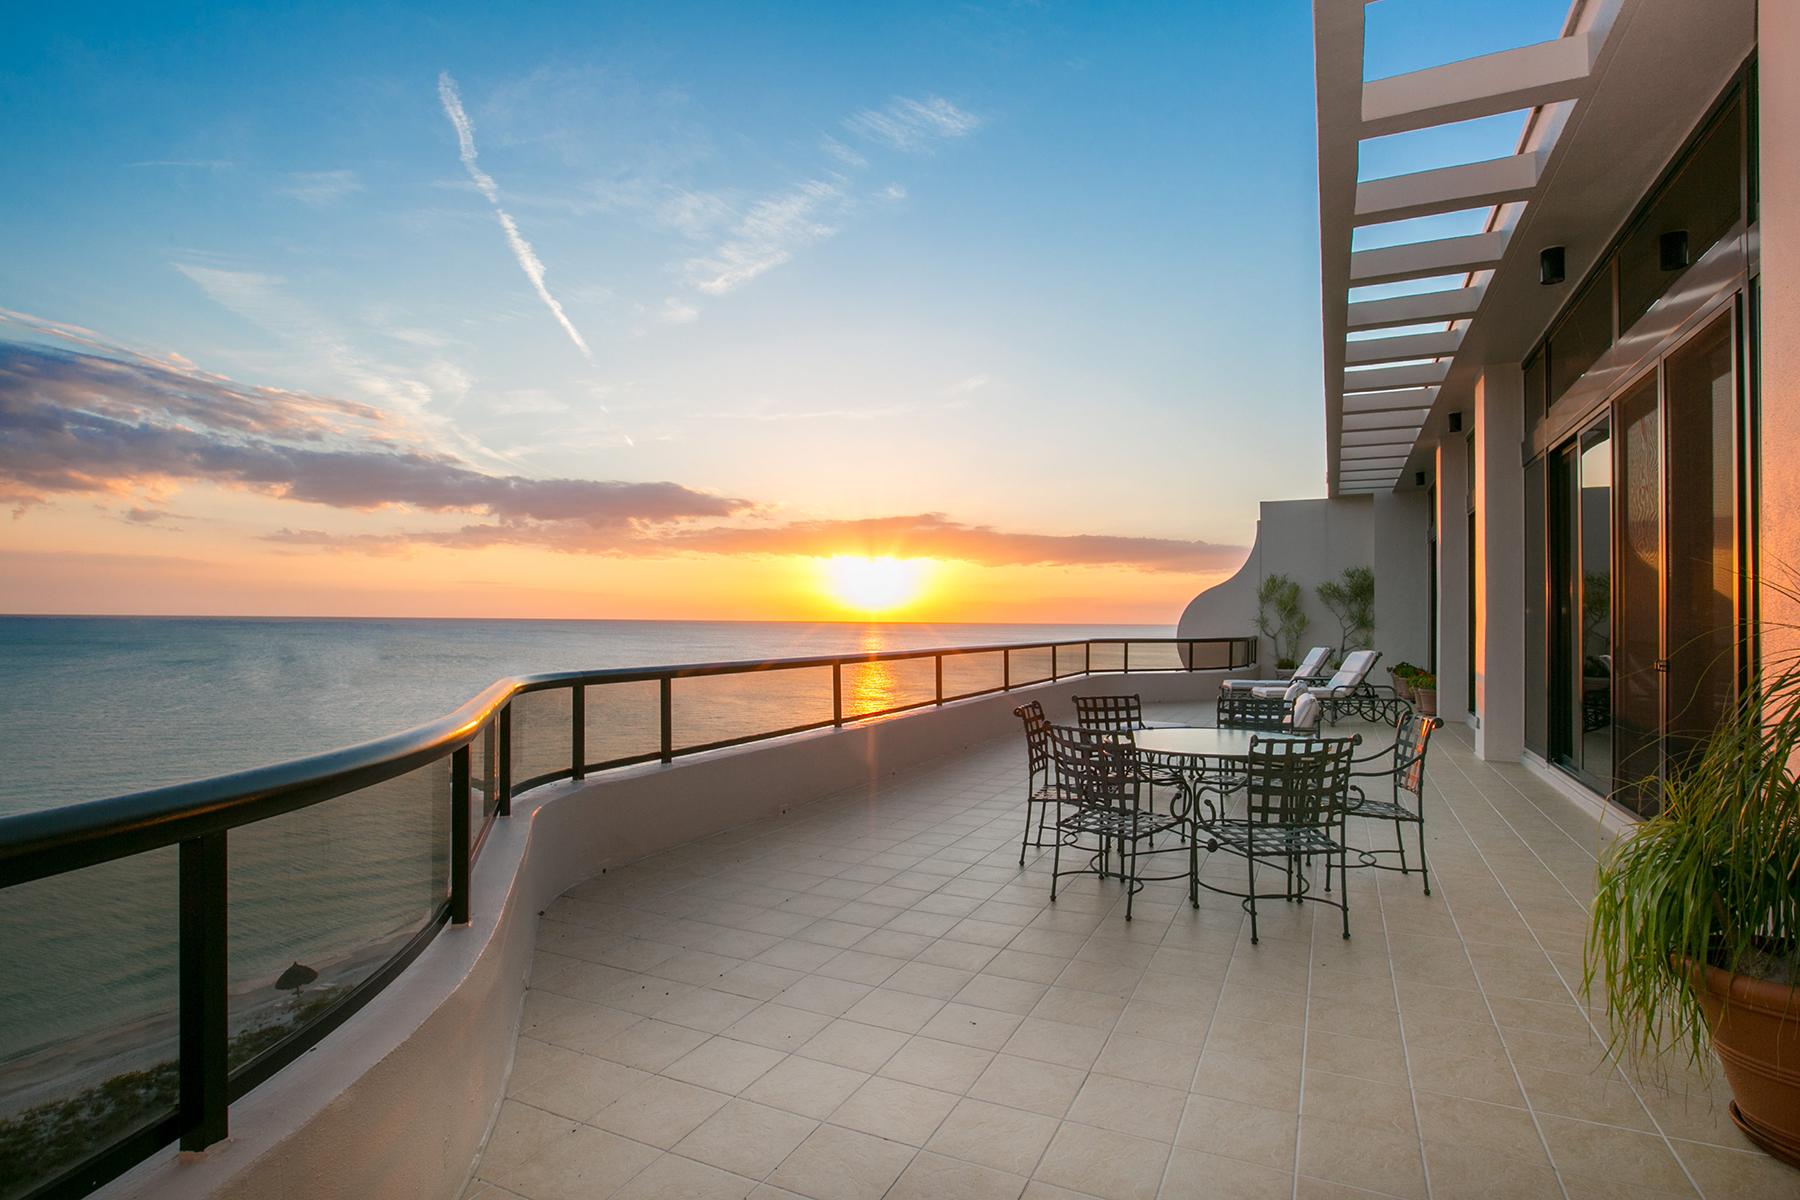 Condominium for Sale at LONGBOAT KEY 415 L Ambiance Dr PH-C Longboat Key, Florida, 34228 United States